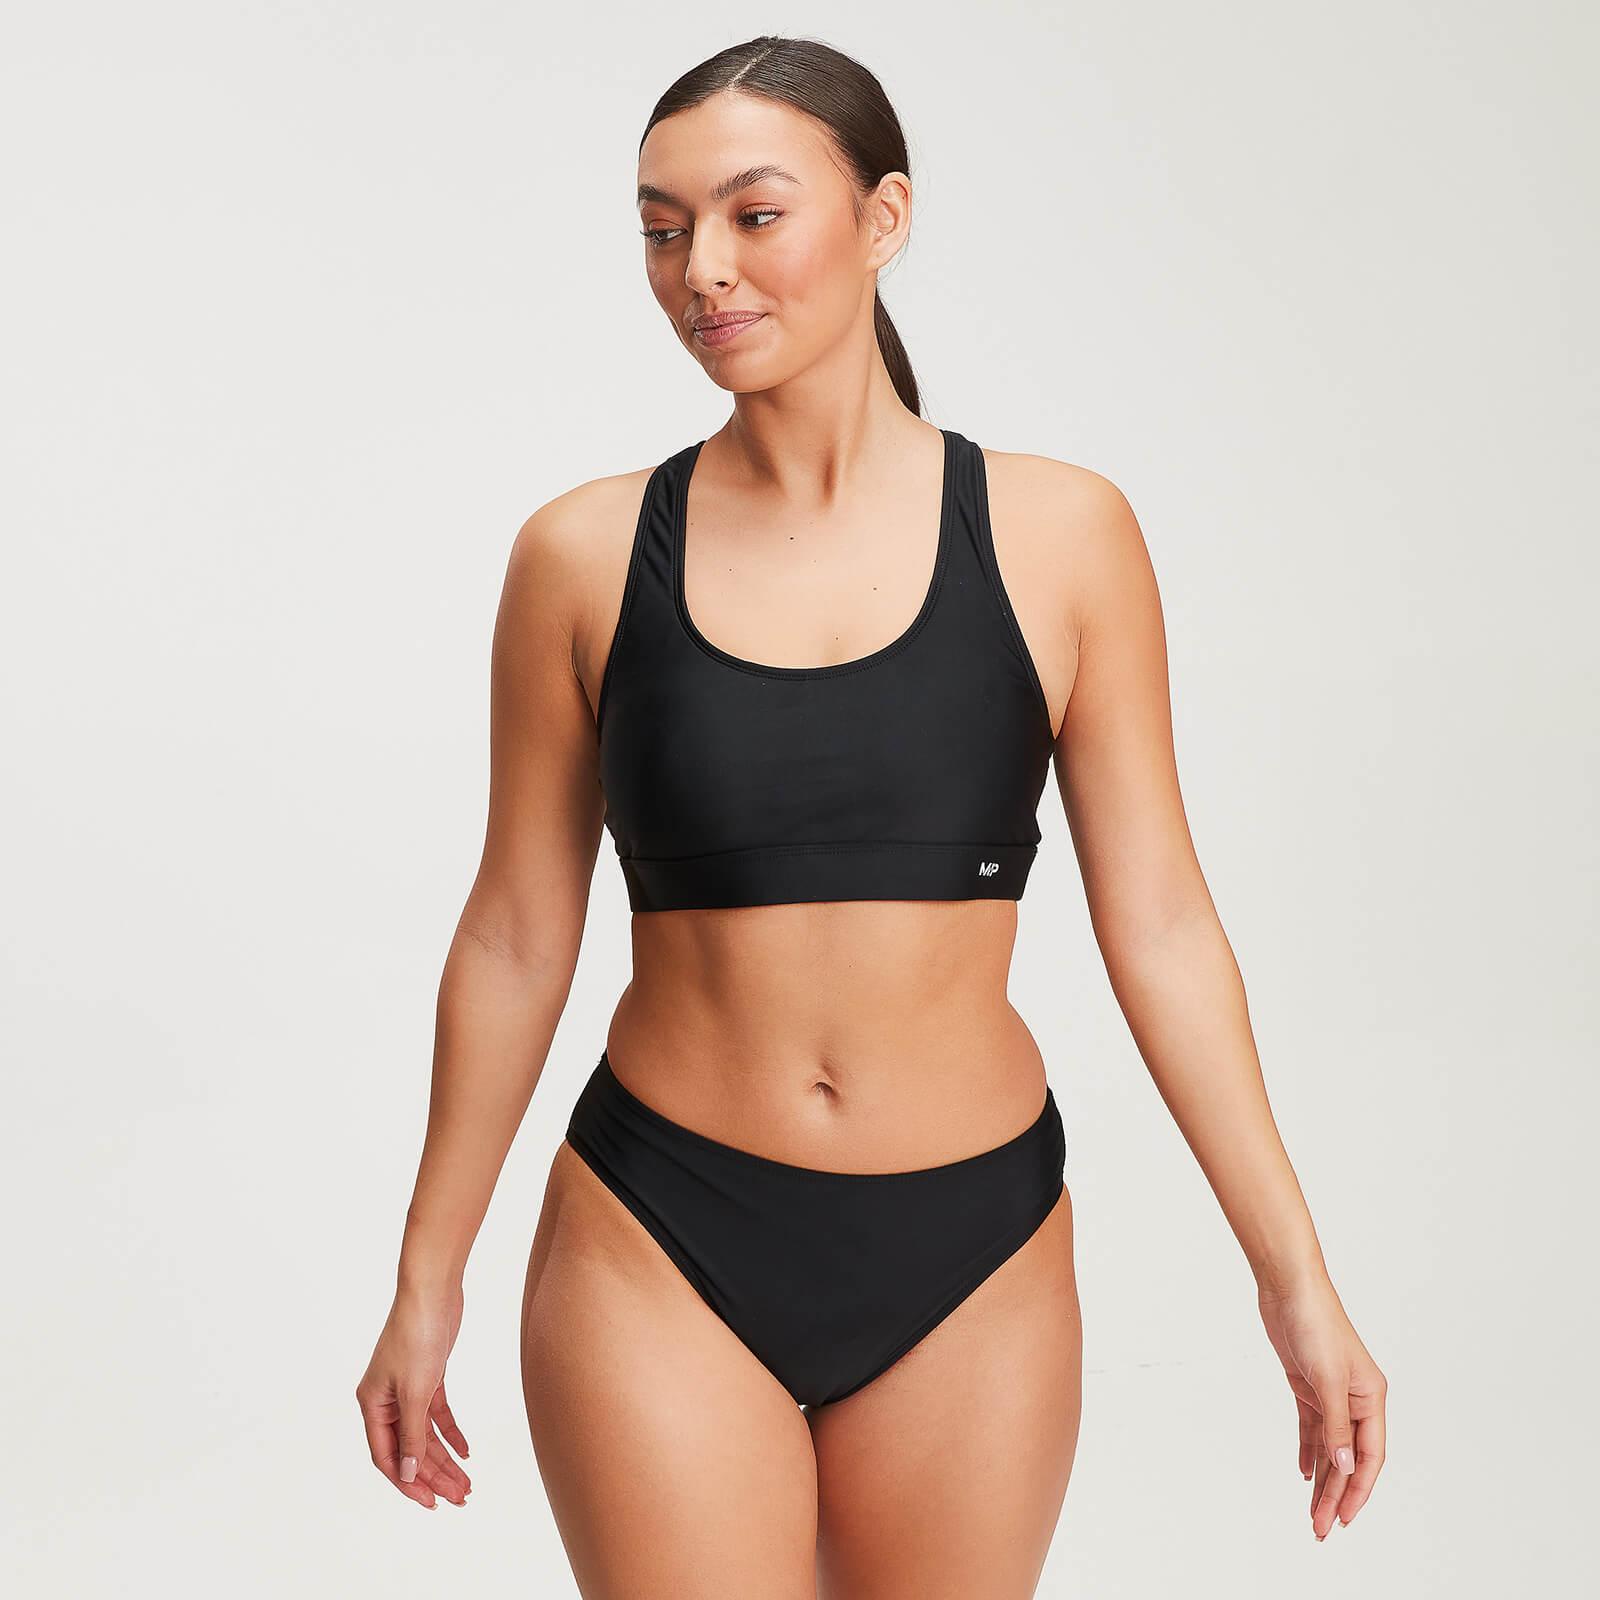 Mp Essentials Bikini Top - Til Kvinder - Sort - S